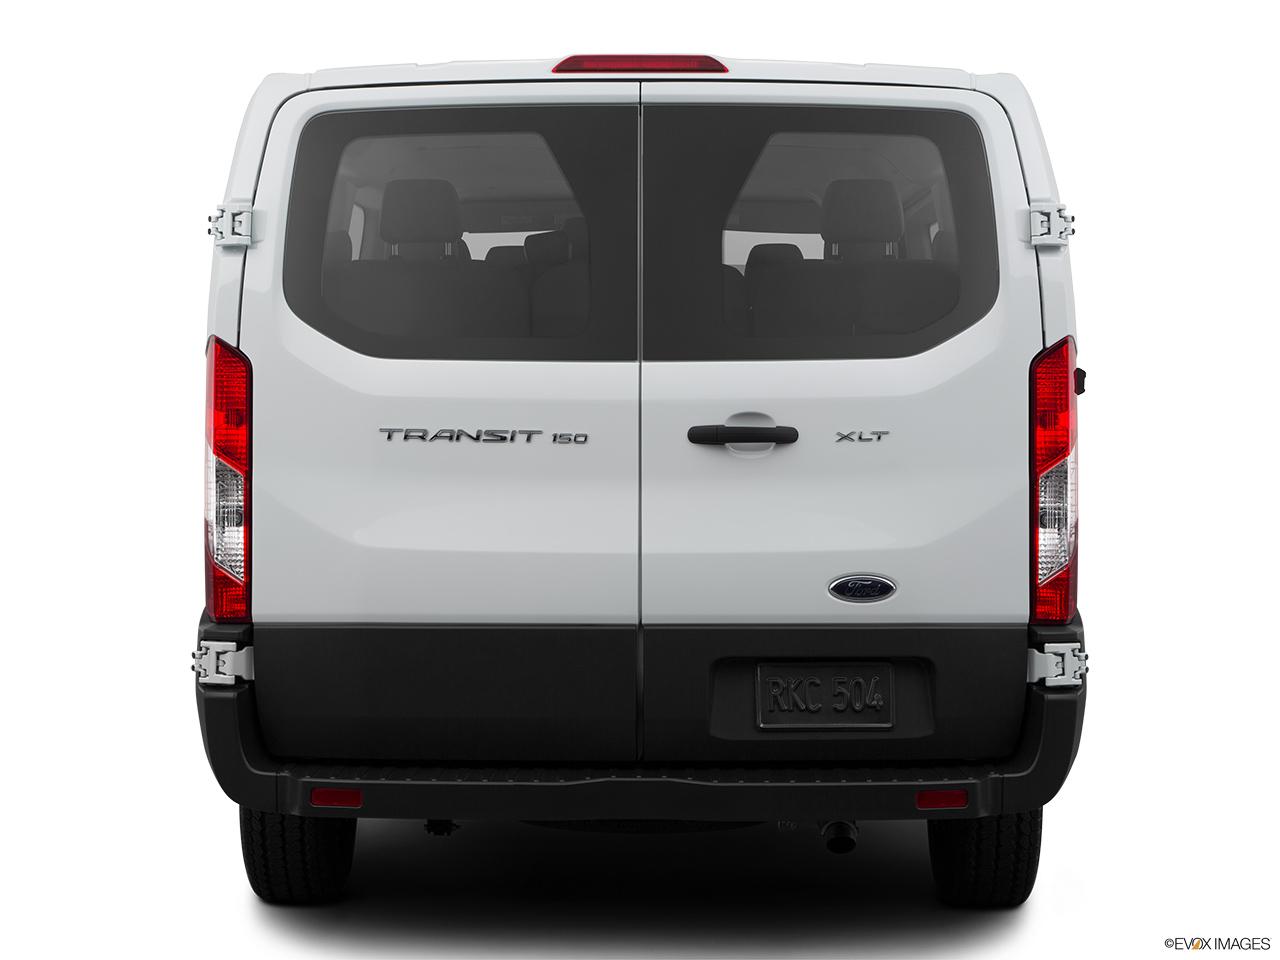 Ford Transit Xlt >> 2015 Ford Transit Wagon T-350 148 Med Roof XL Sliding RH Dr - Low/wide rear